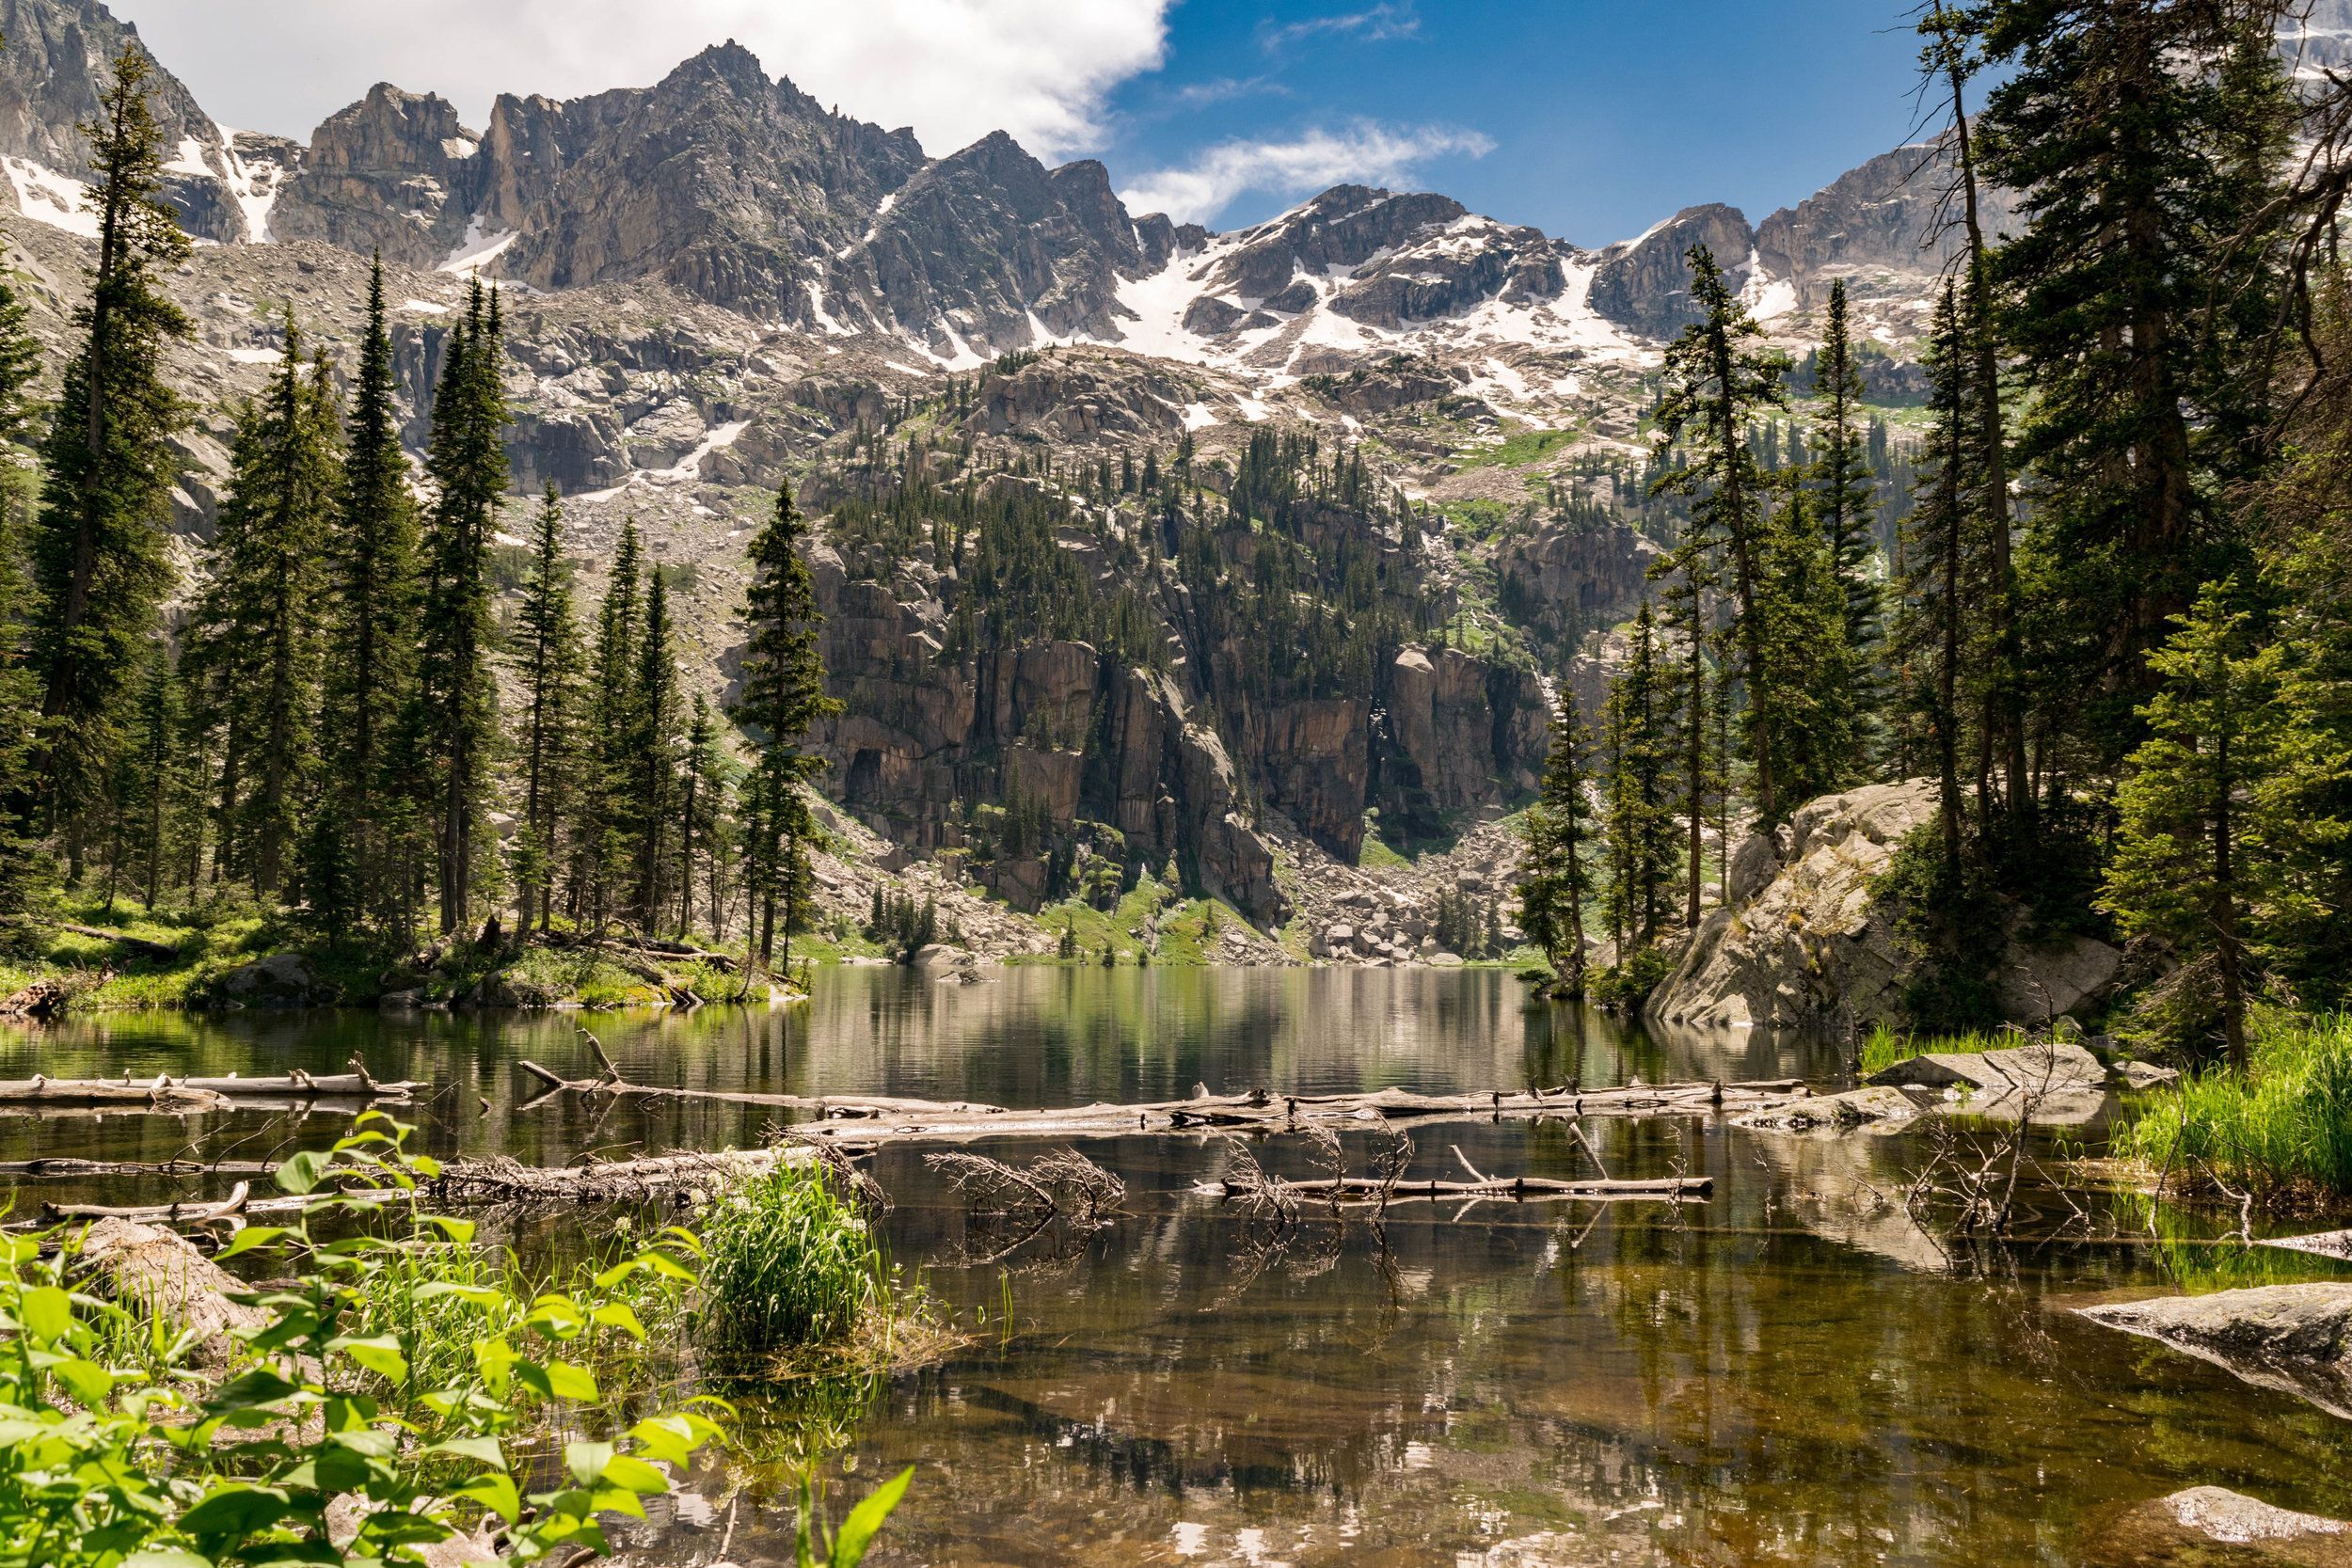 Among The Wild - Weekend Getaway: Mirror Lake (Granby, CO) | Road trip to  colorado, Mirror lake, Granby colorado